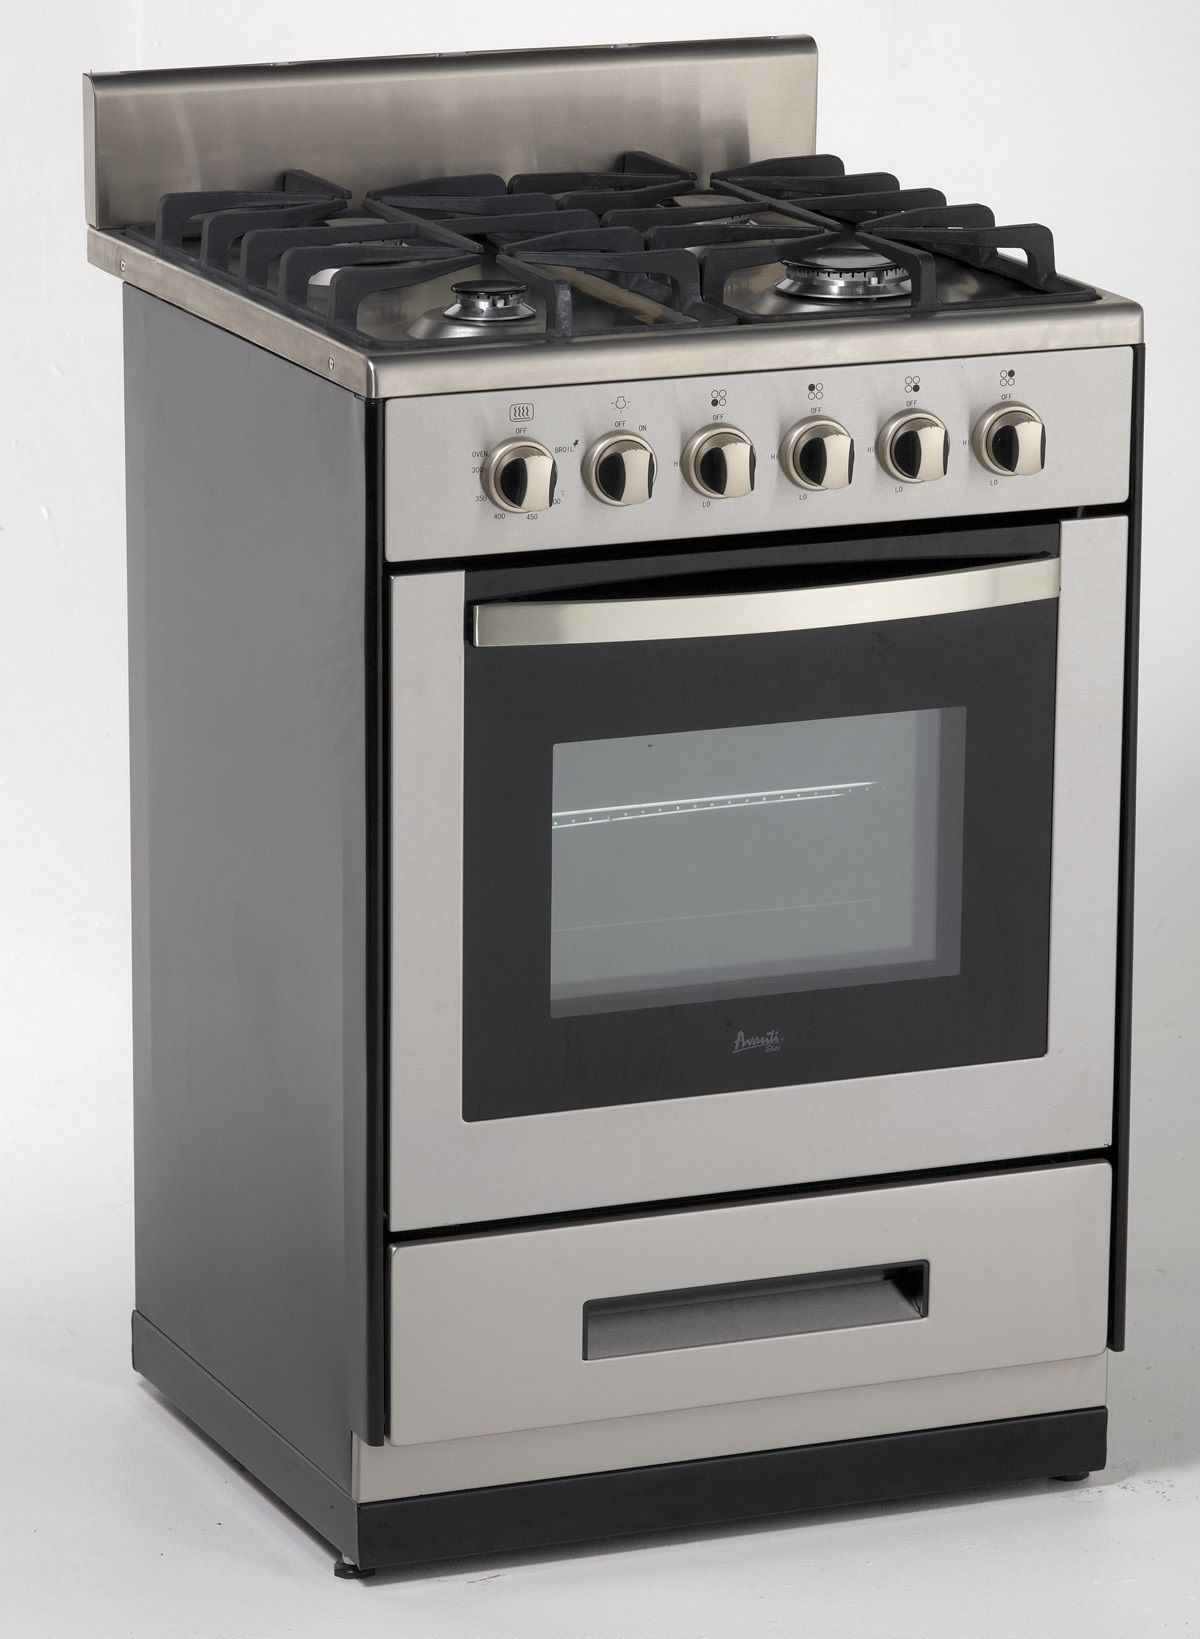 Whirlpool WFG540H0AS Mini stove, Kitchen stove, Oven